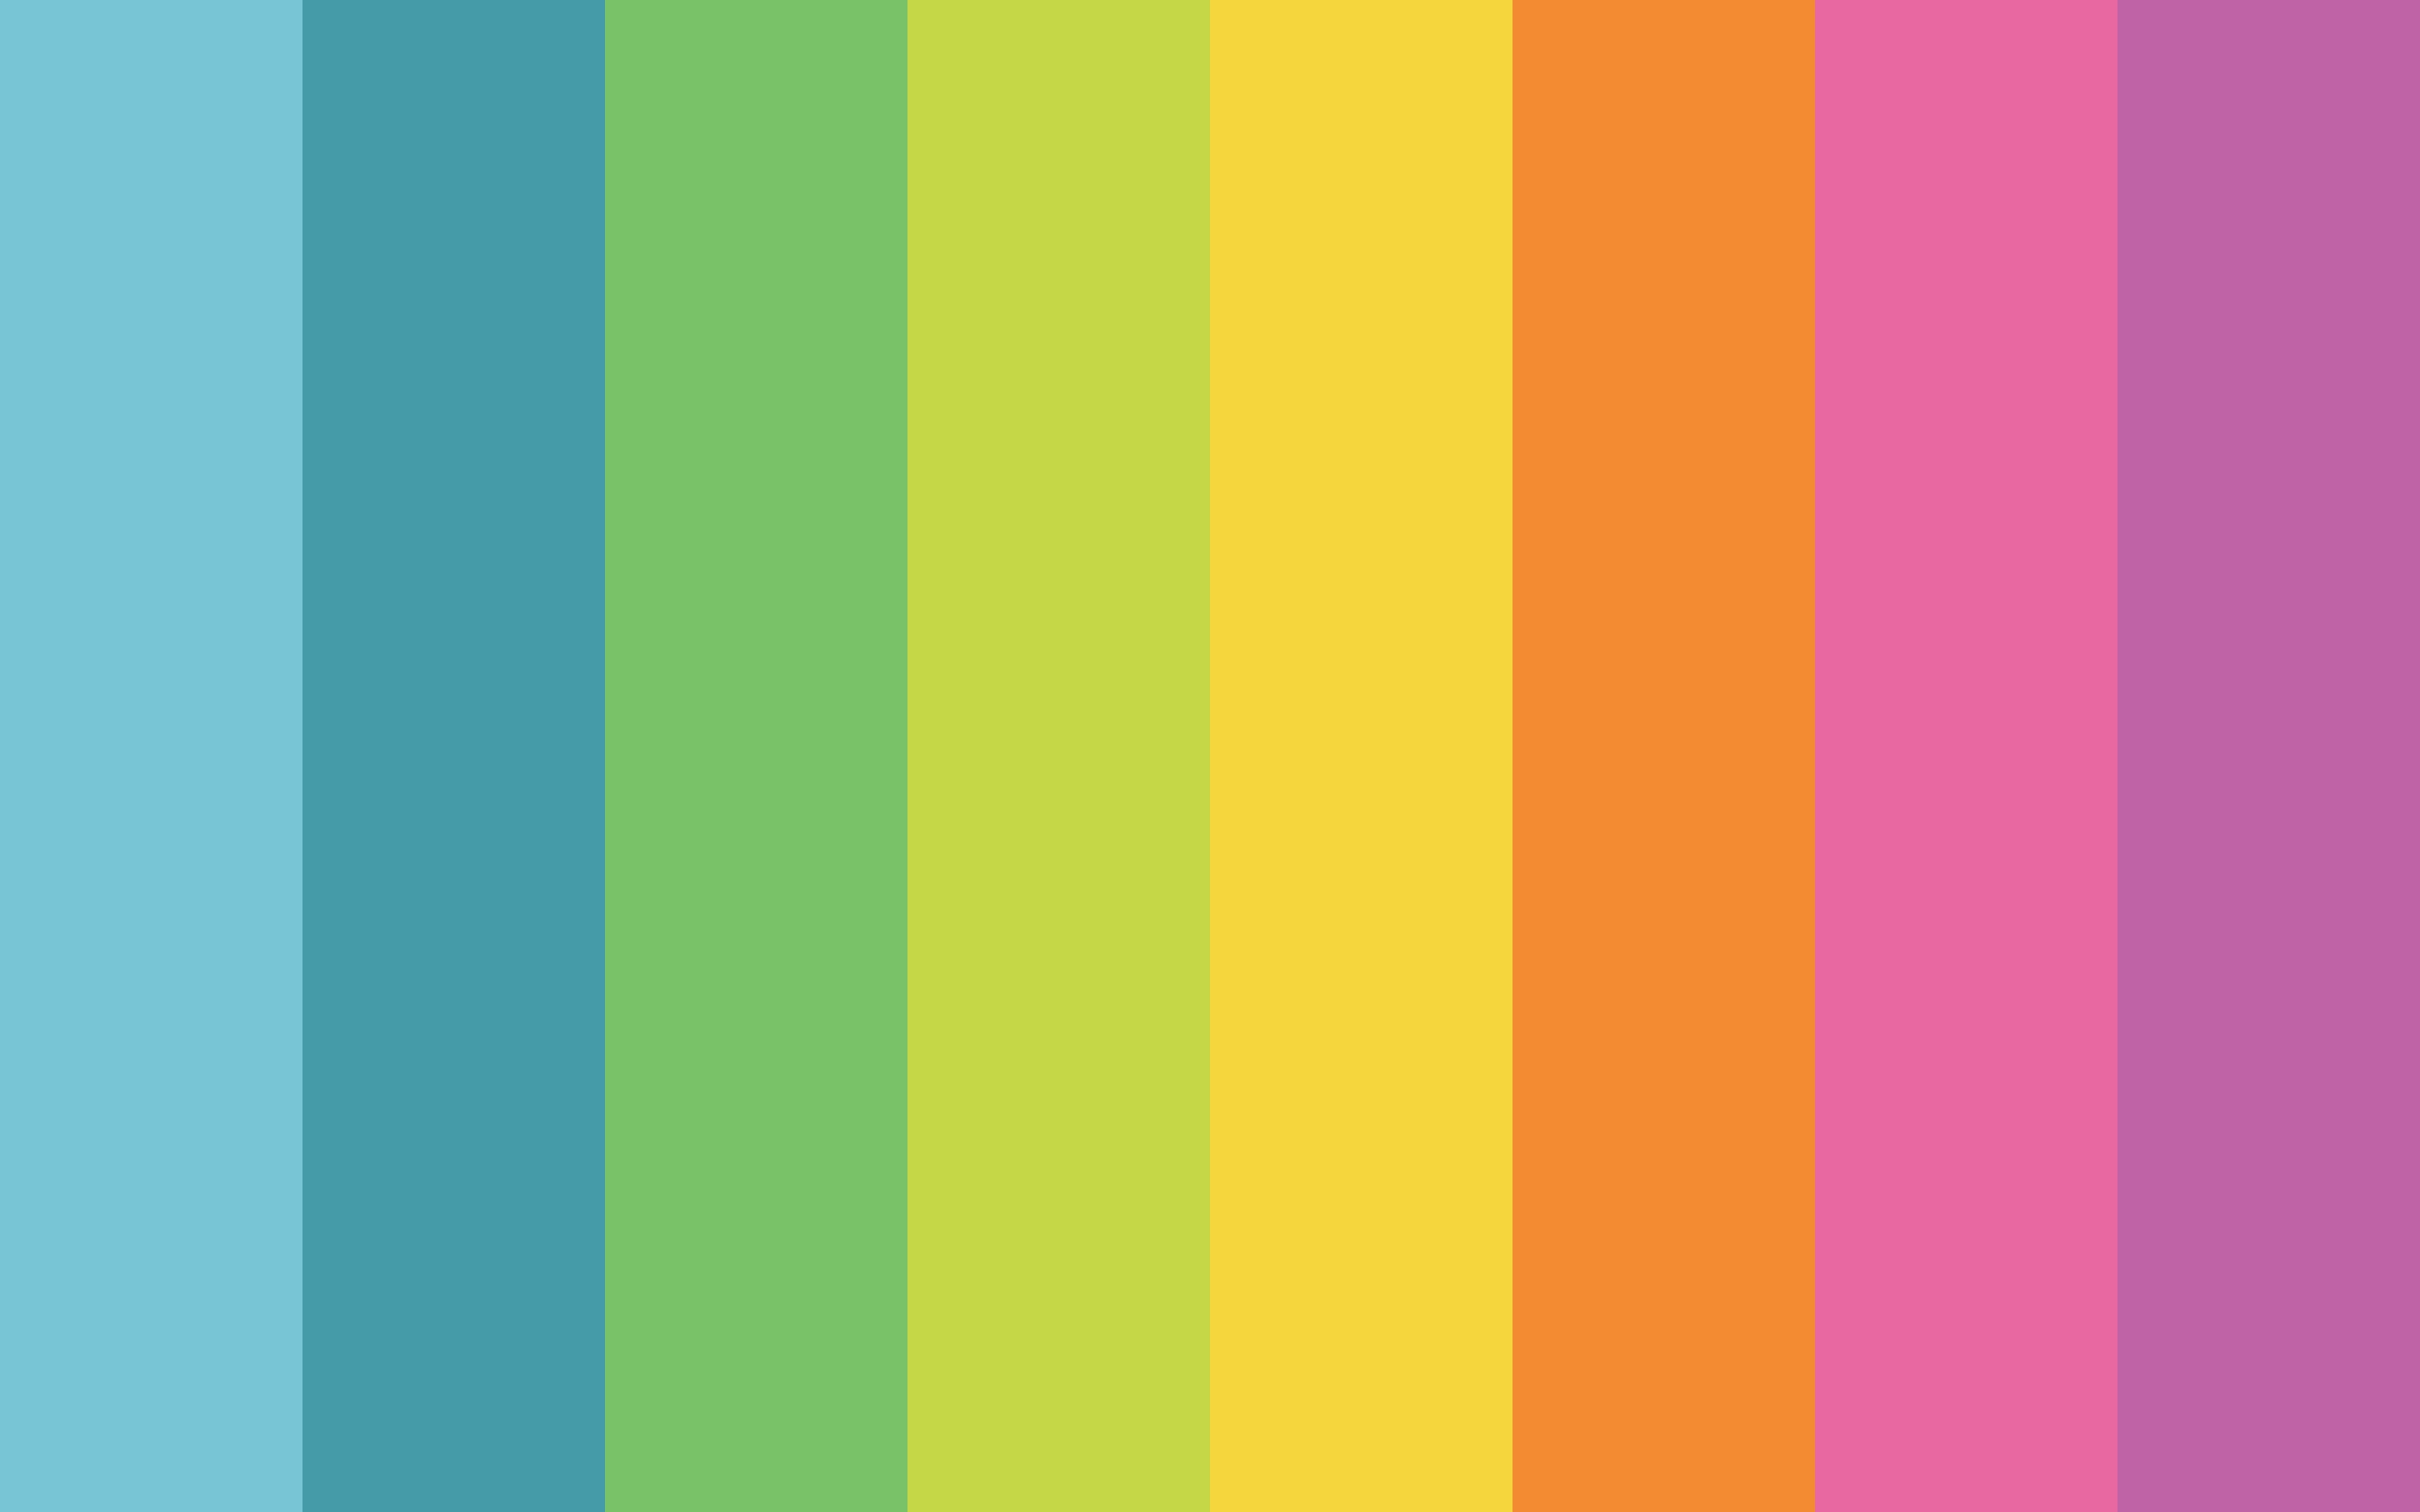 Minimal Rainbow Wallpapers